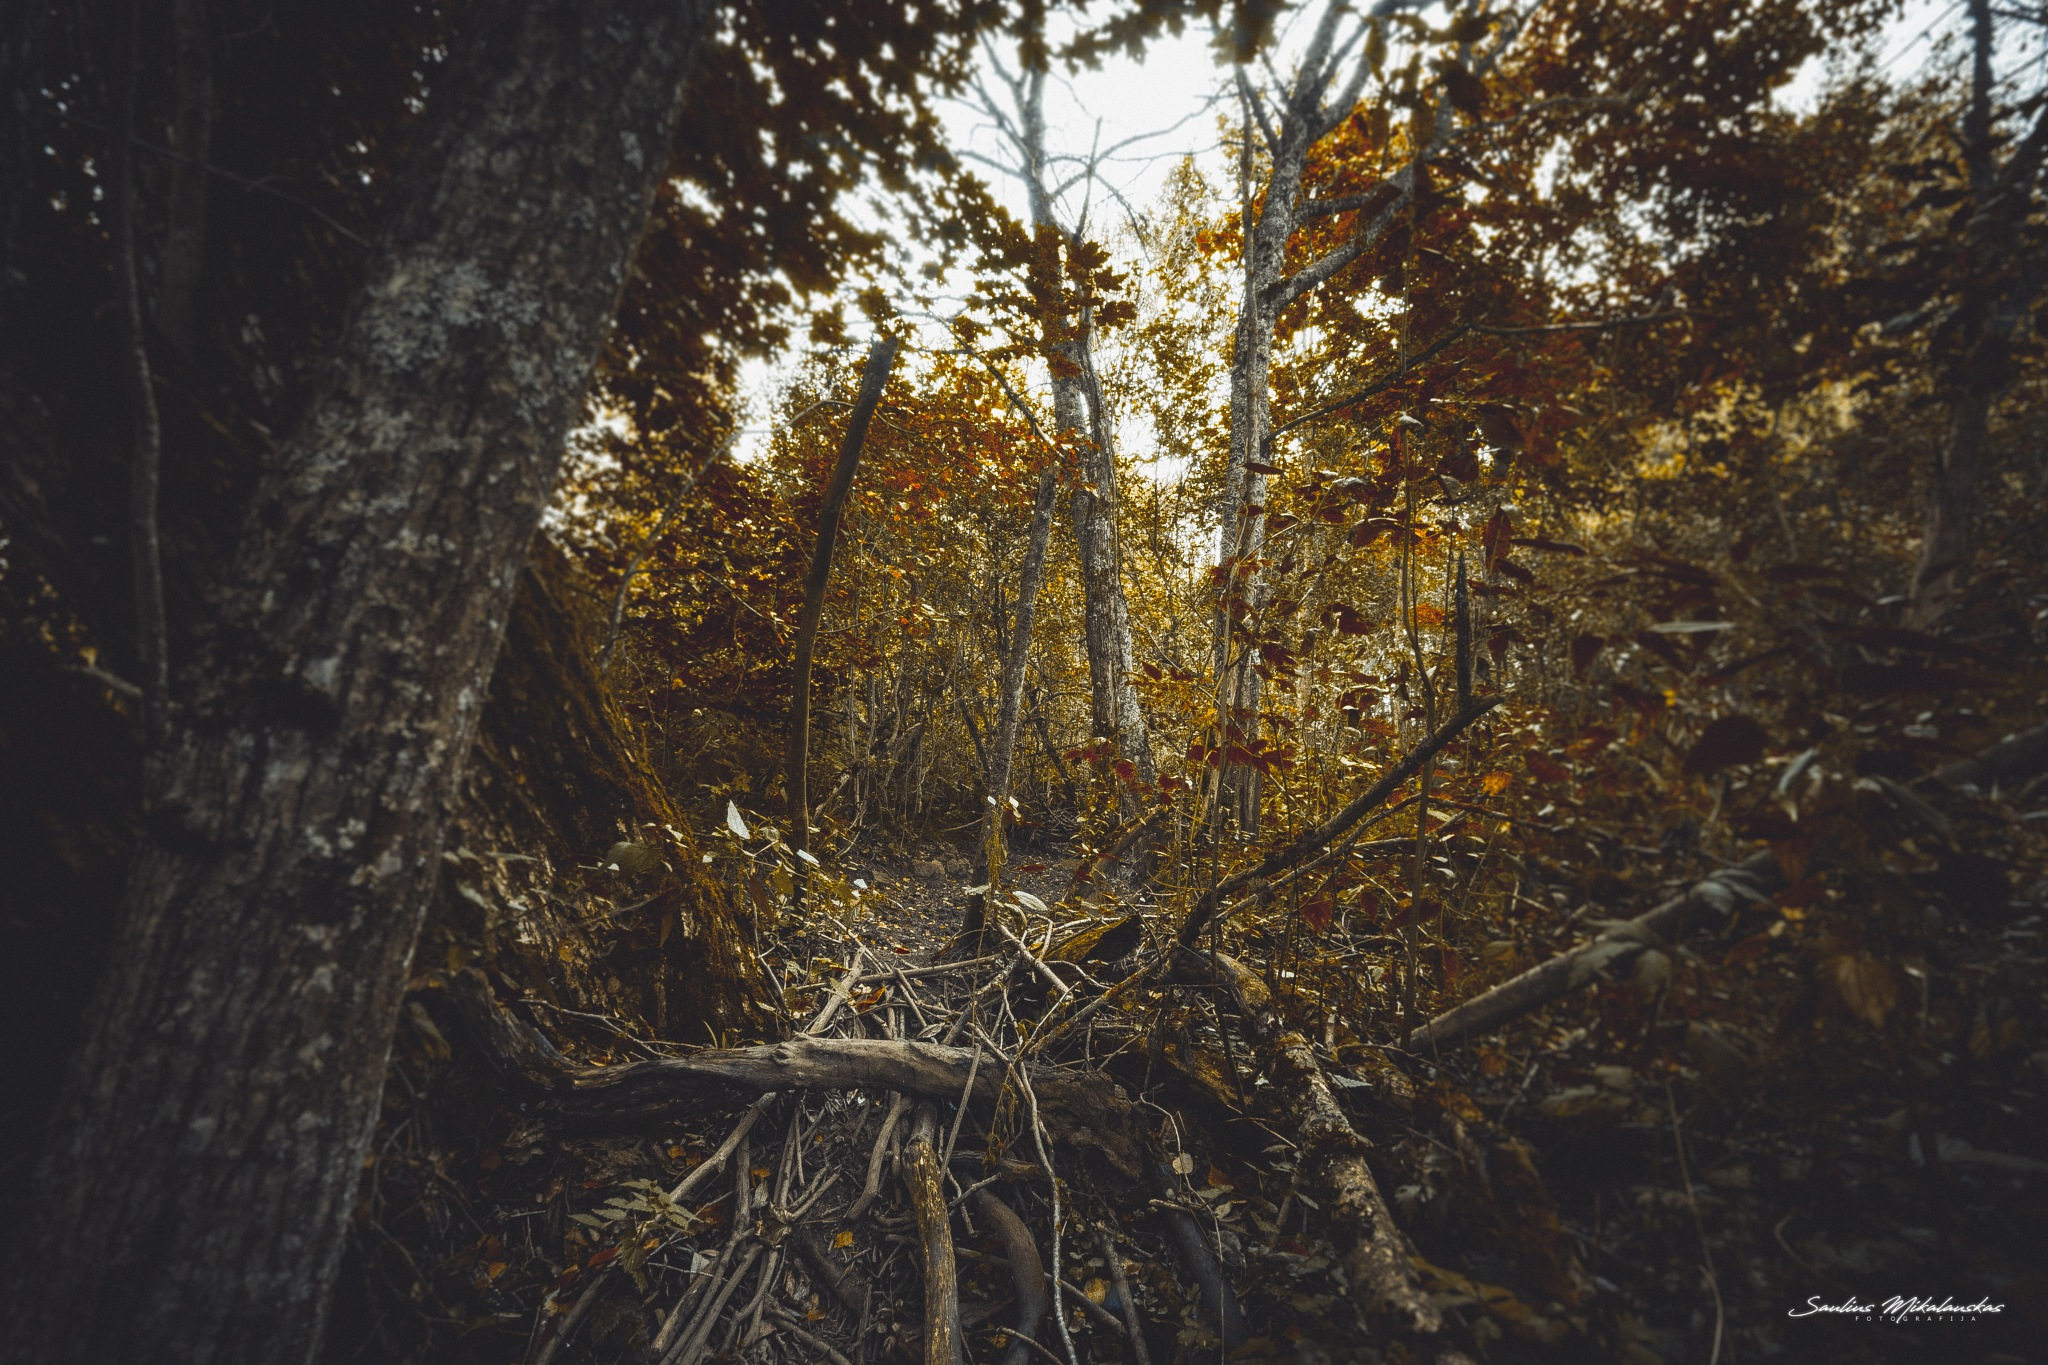 Forest by Saulius Mikalauskas